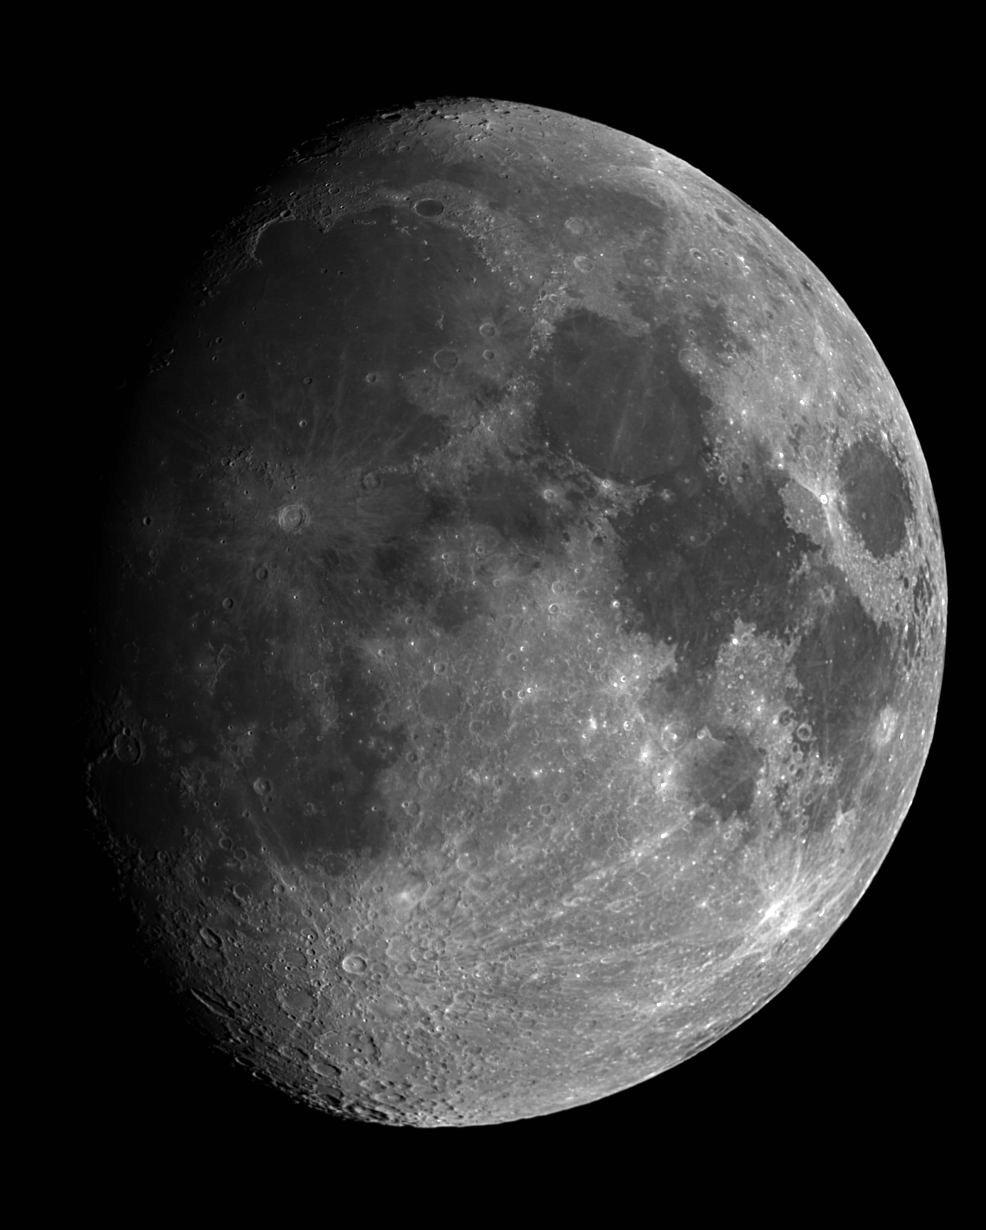 2021-01-24-lune-c11-asi2600-red3.jpg